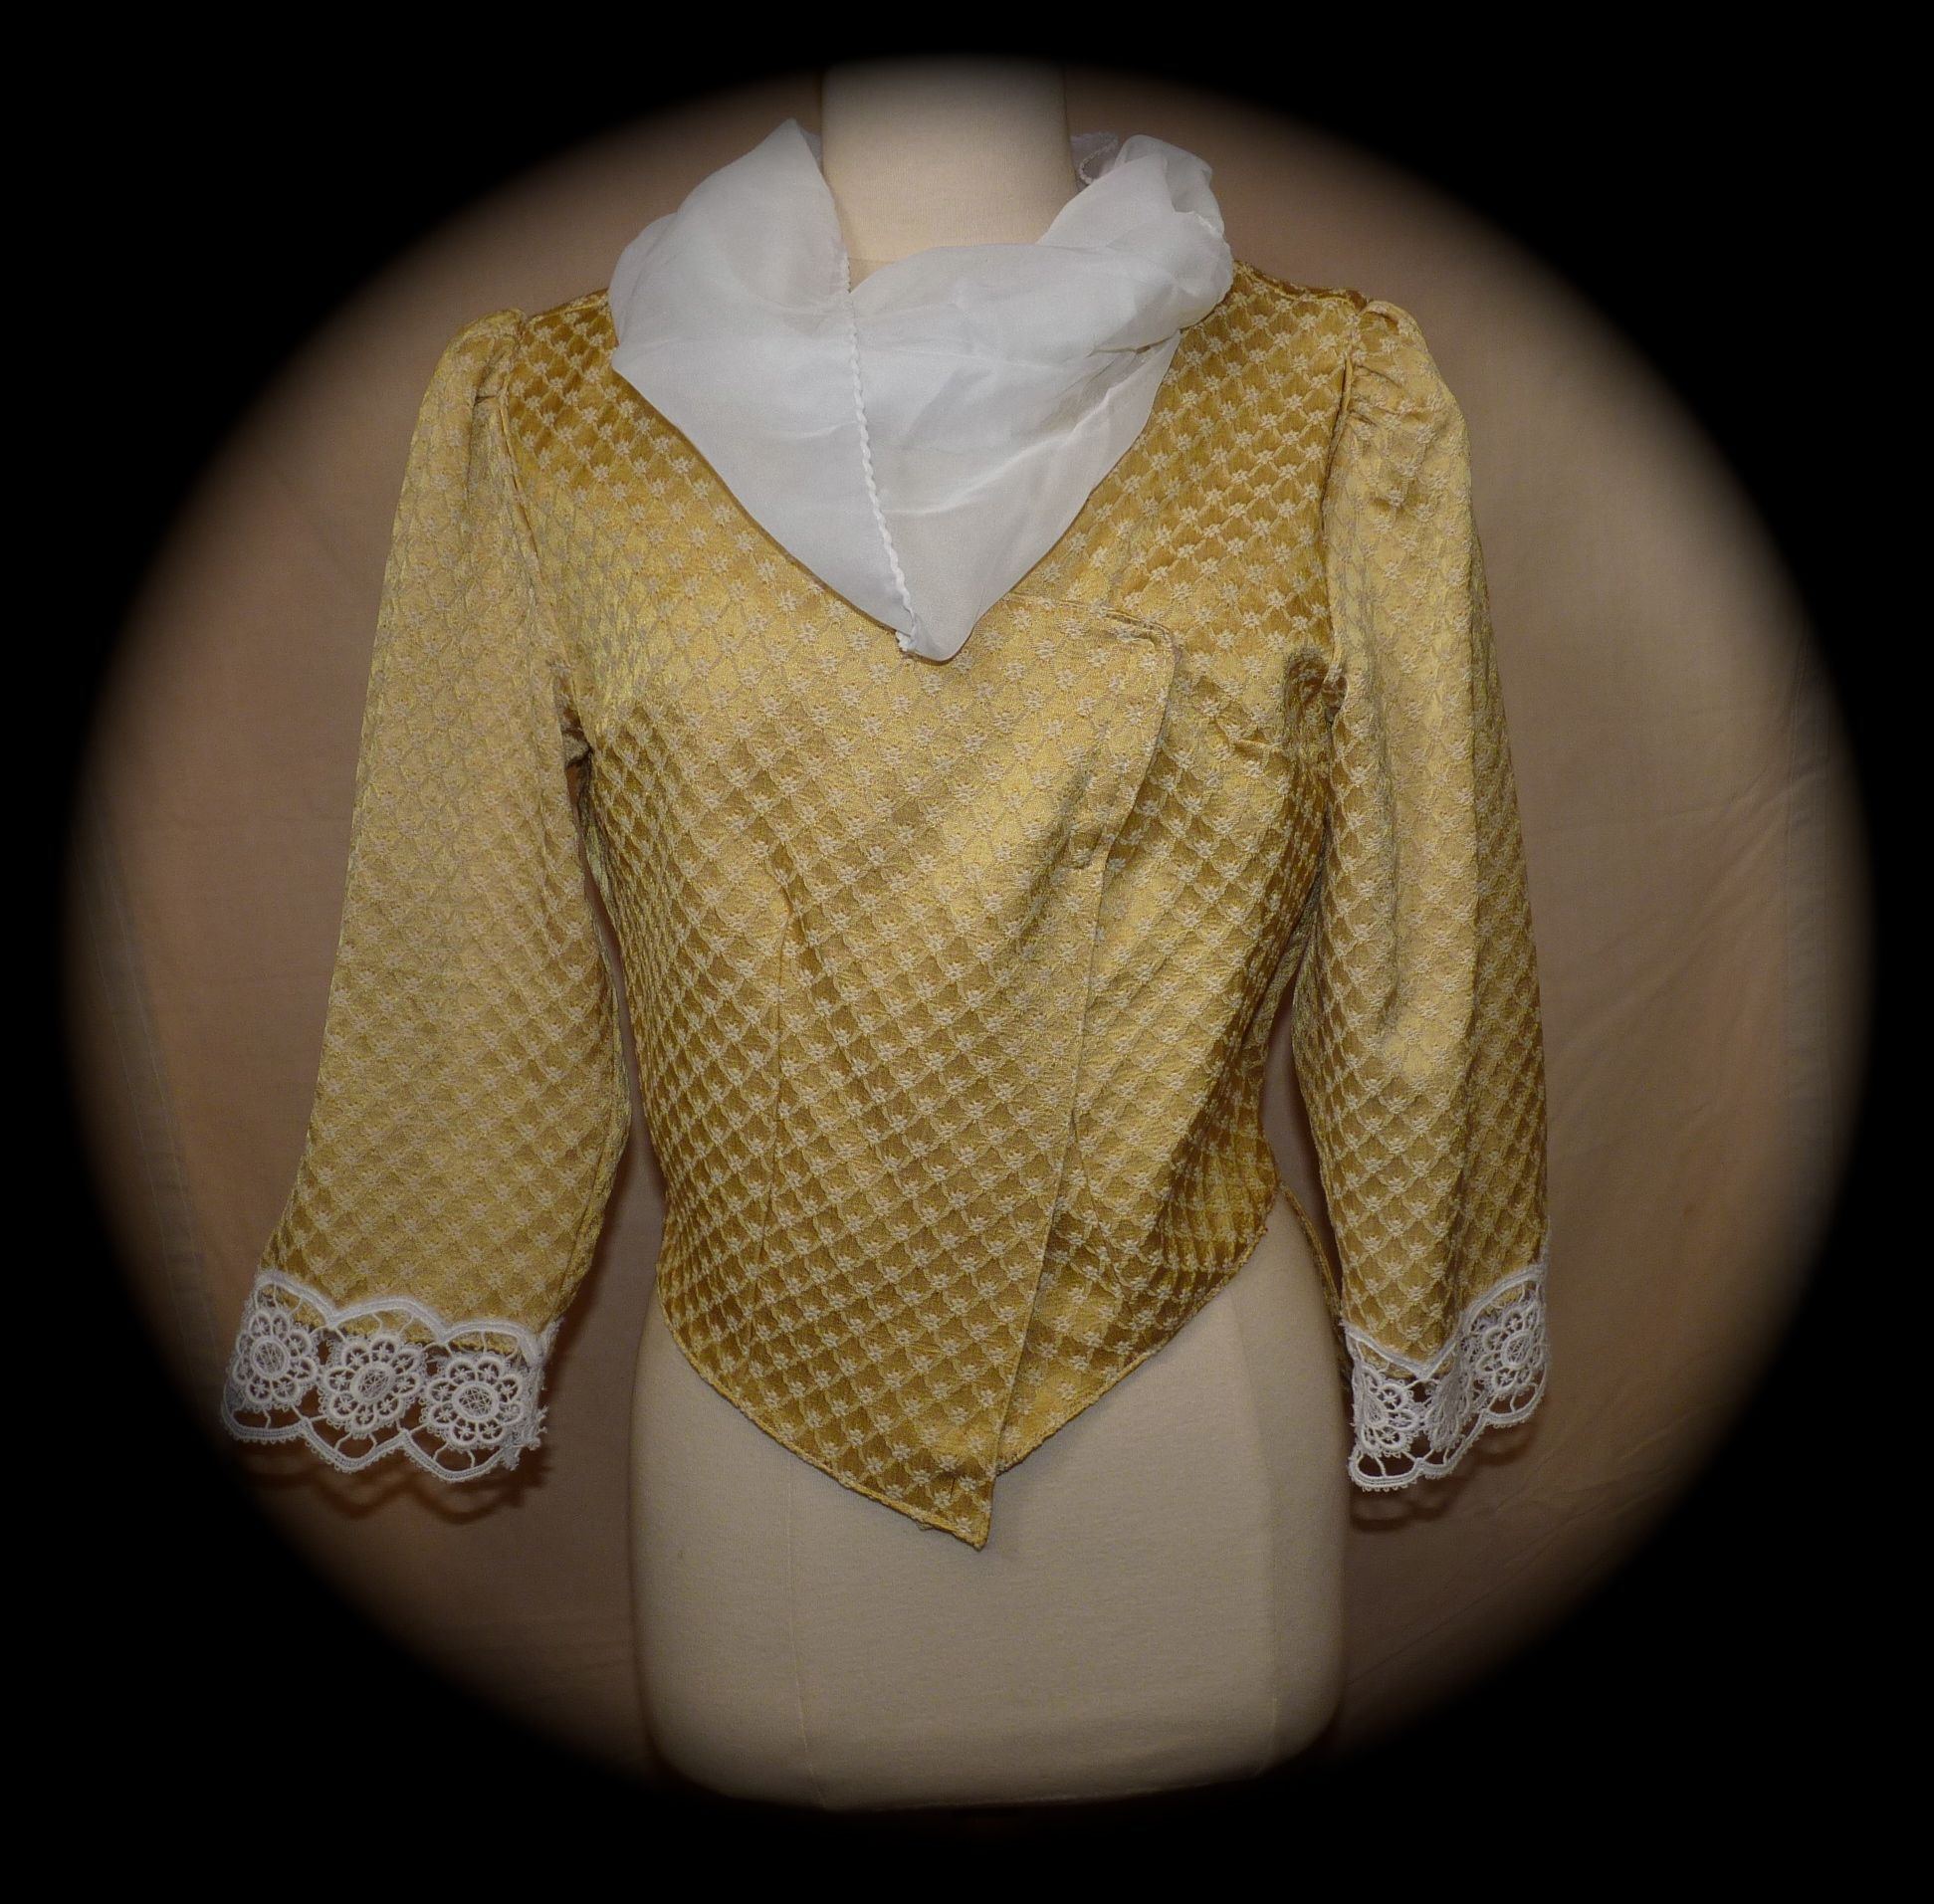 veste damassée jaune